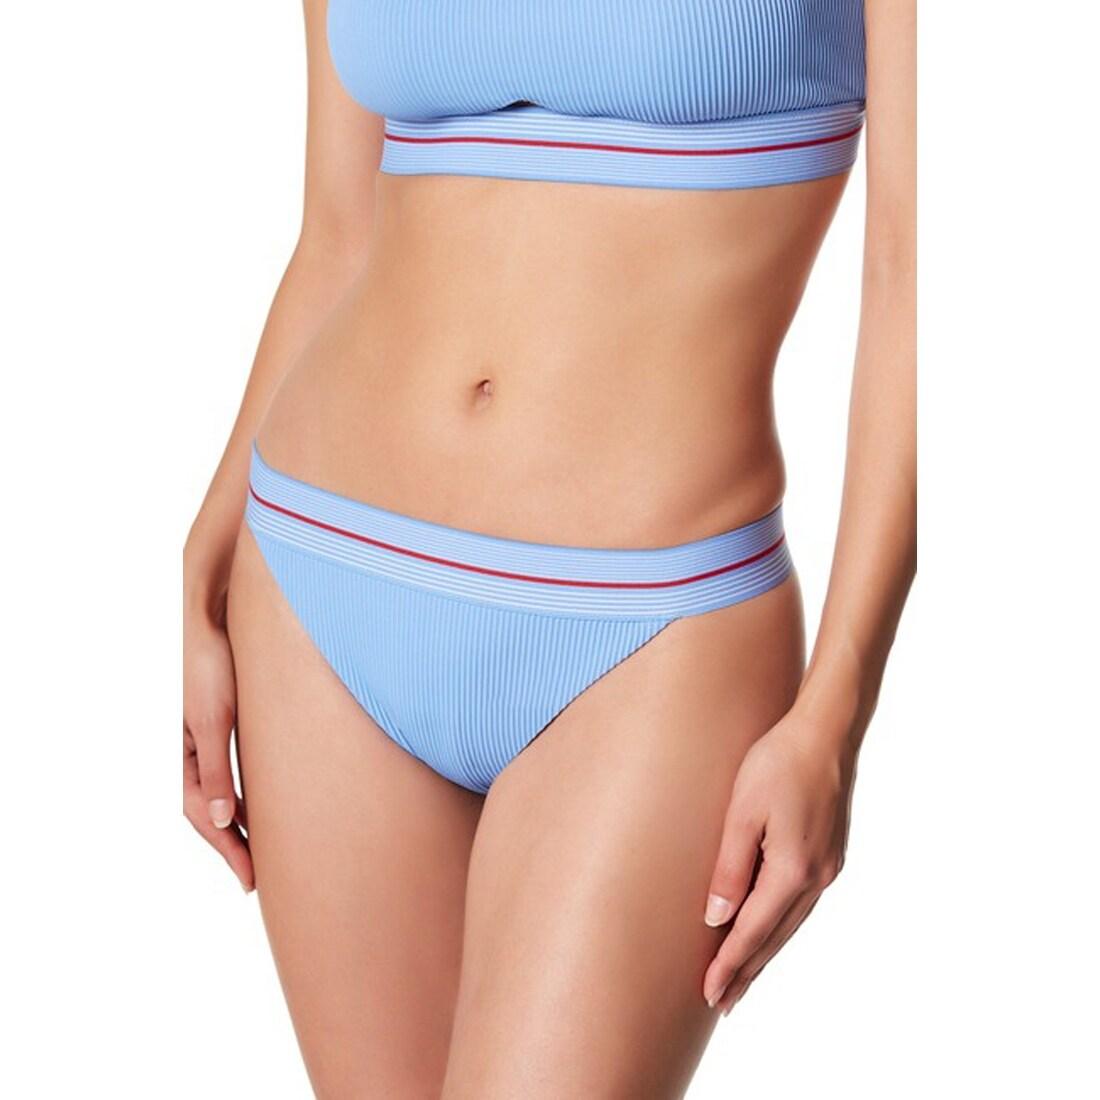 Dolce Vita Womens The Tides Tie Dye Hipster Bikini Bottom